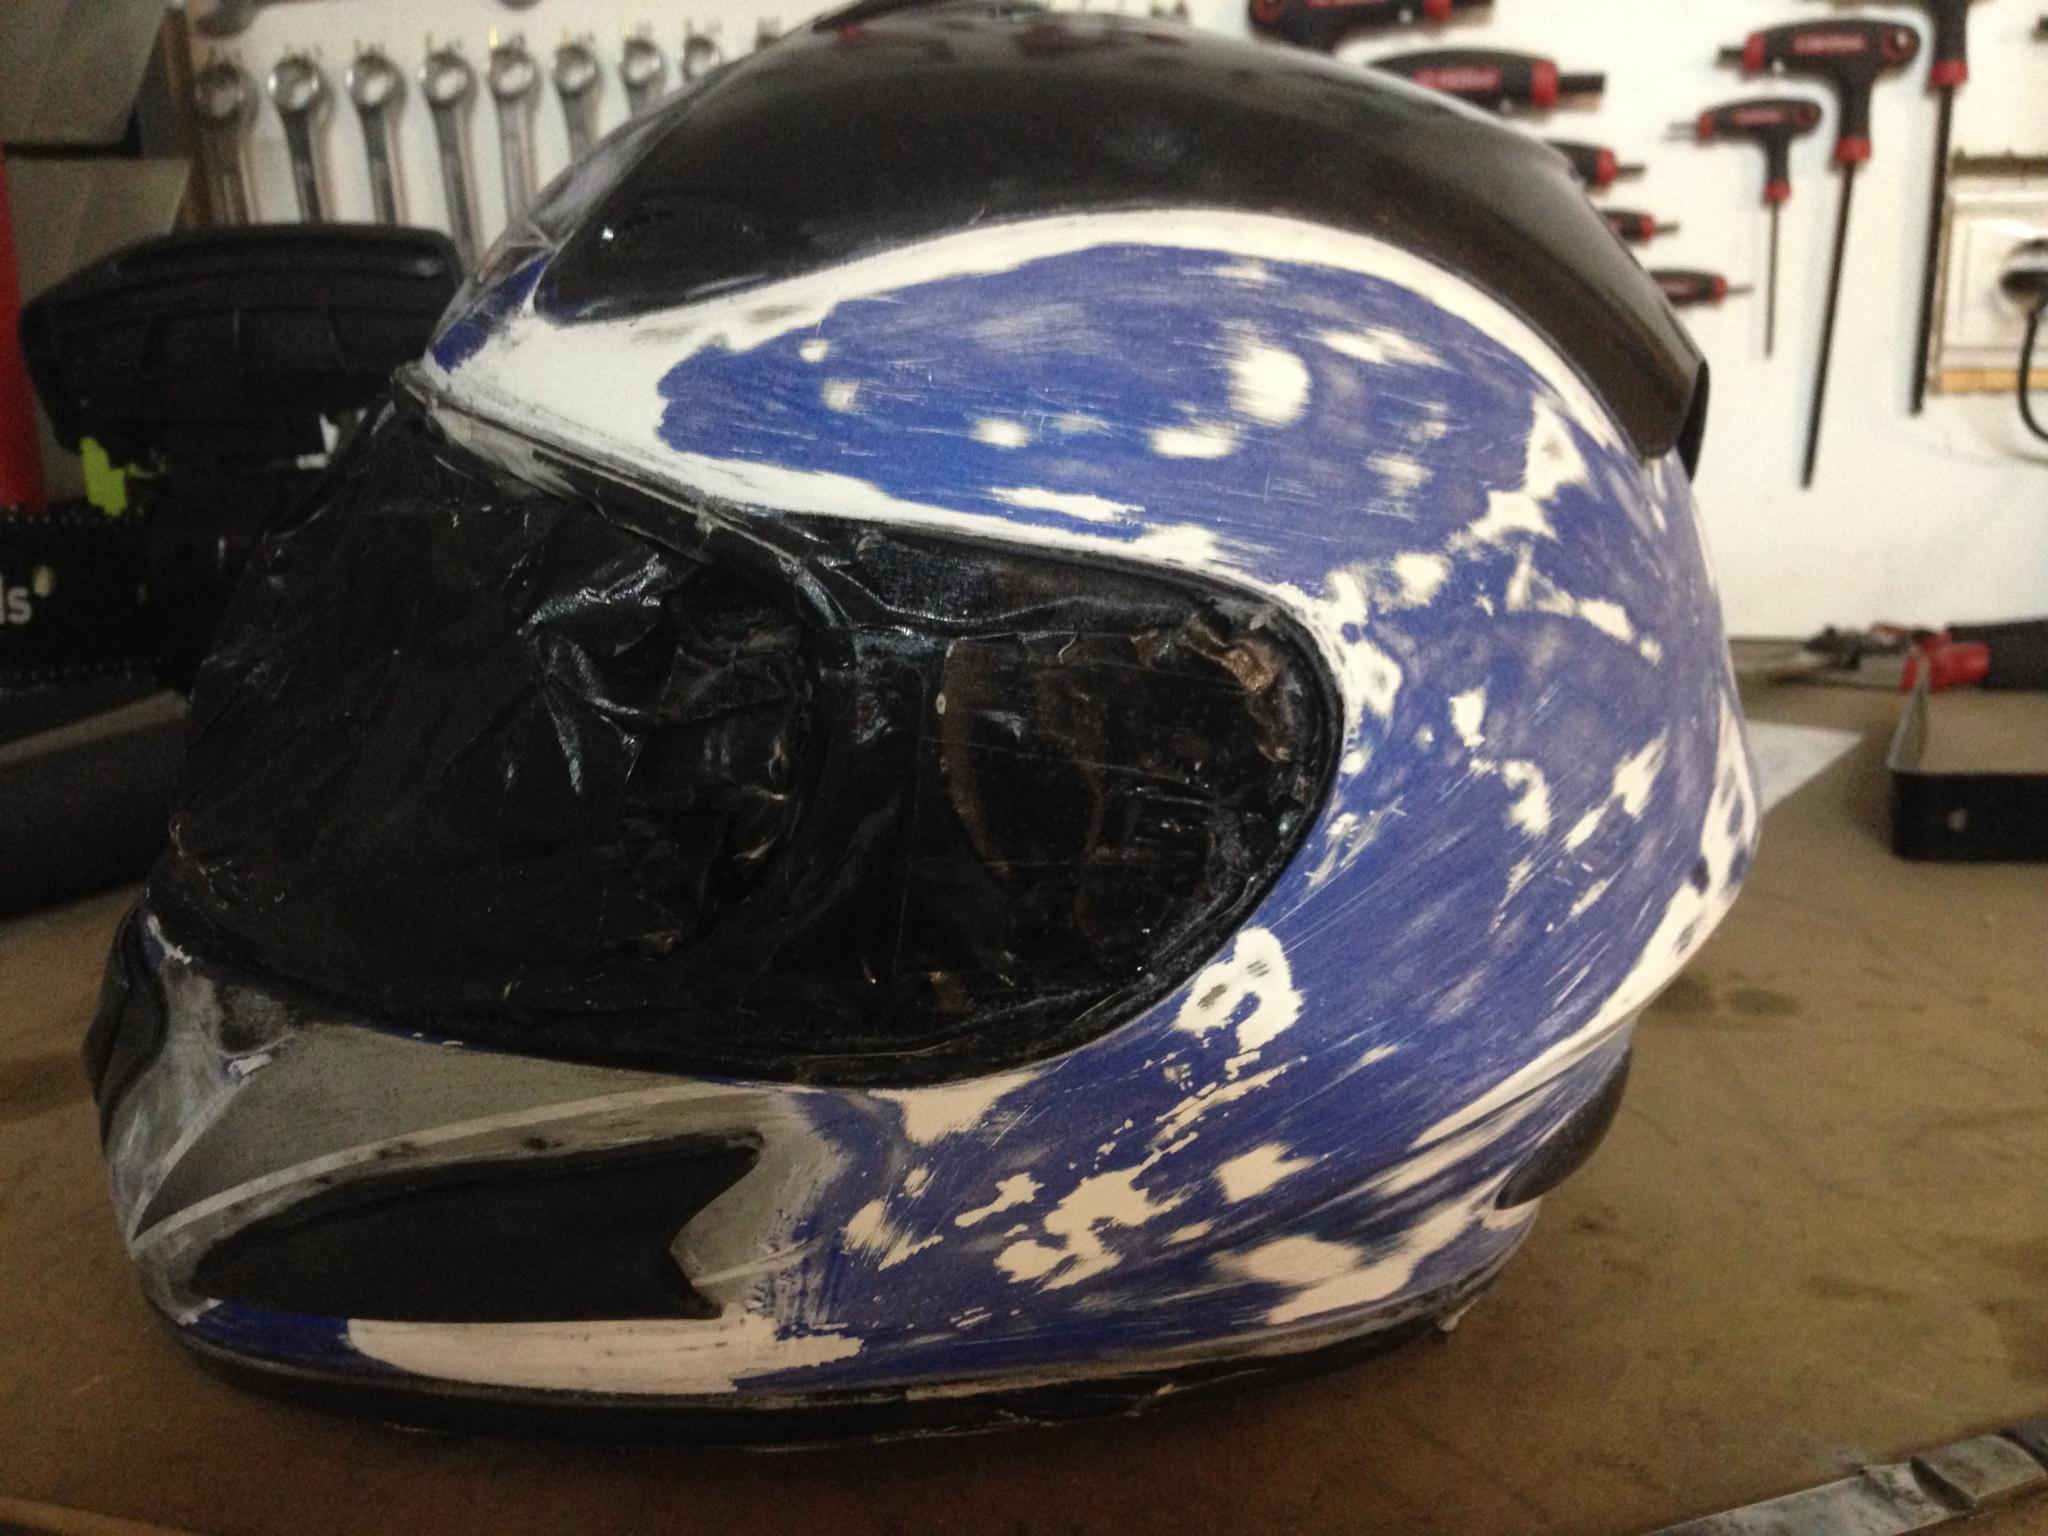 Autocolantes na moto/capacete  2v7z7kg